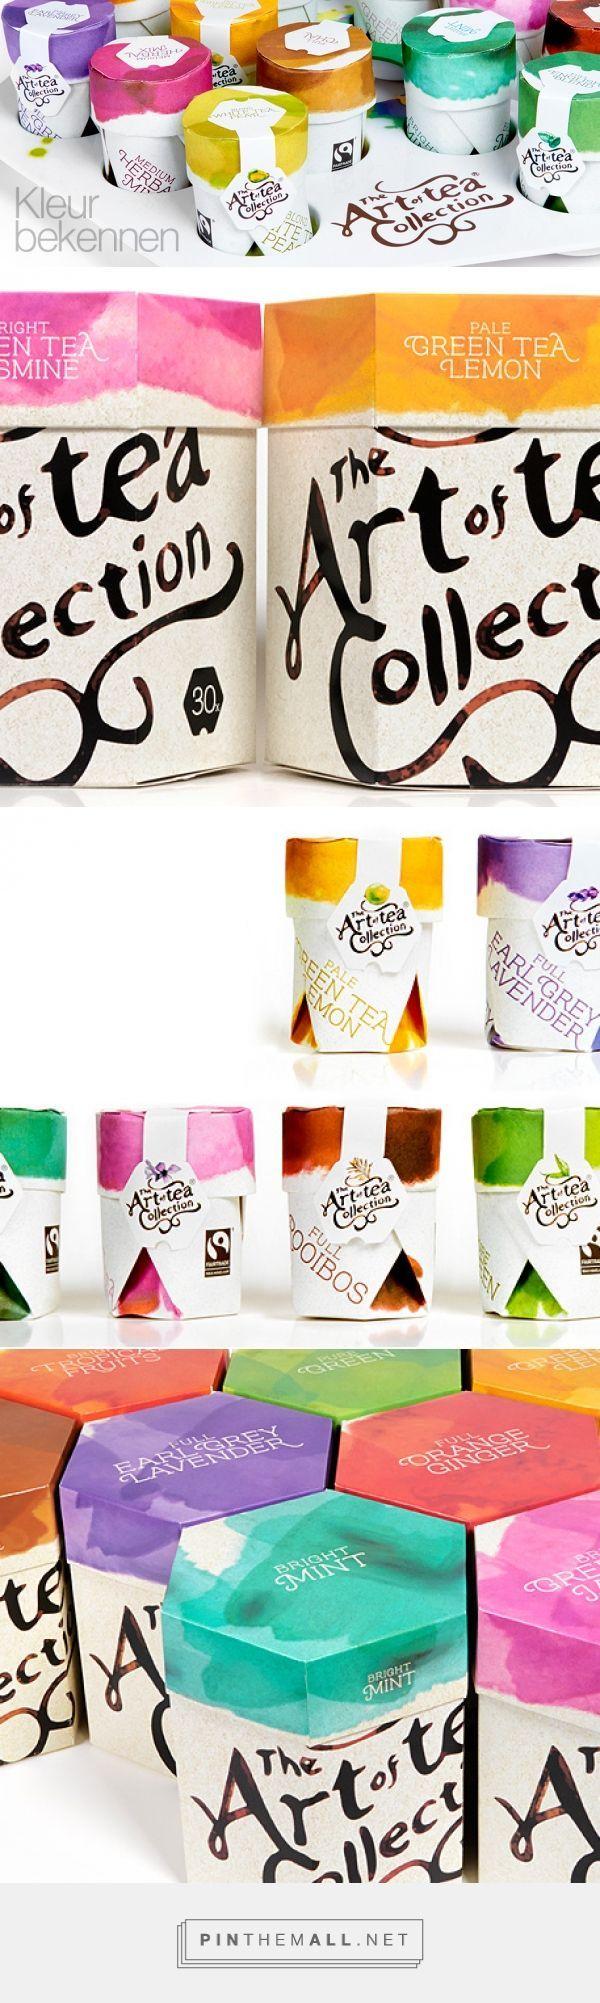 Lovely brand identity. Beautiful colors. Art of Tea